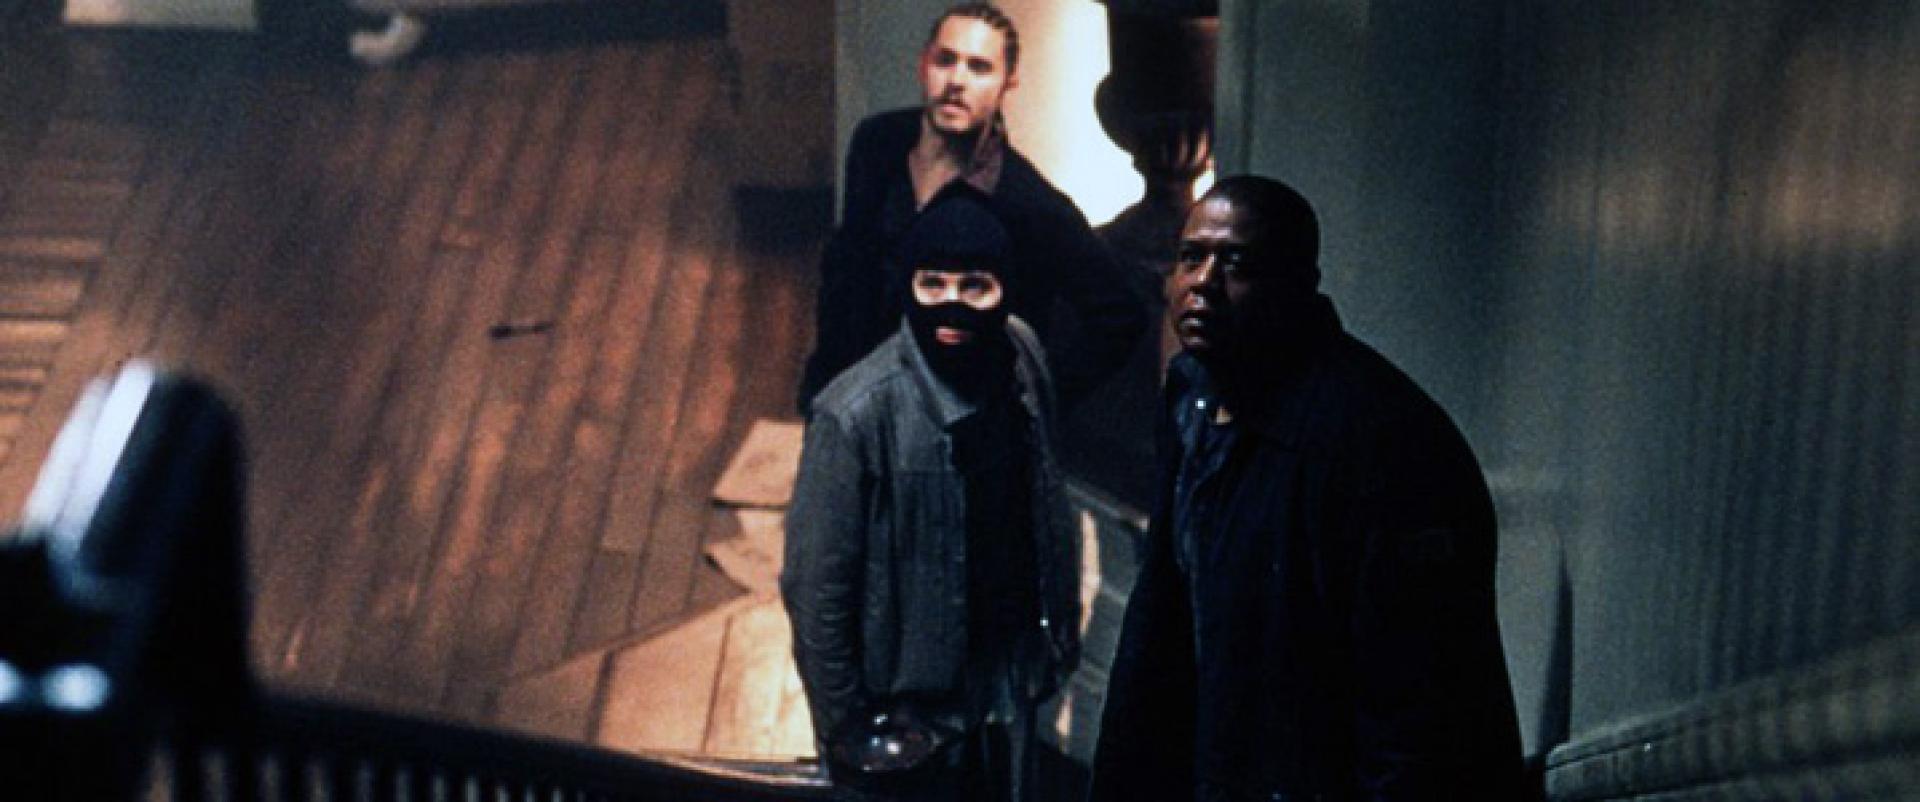 Top 5 home invasion film